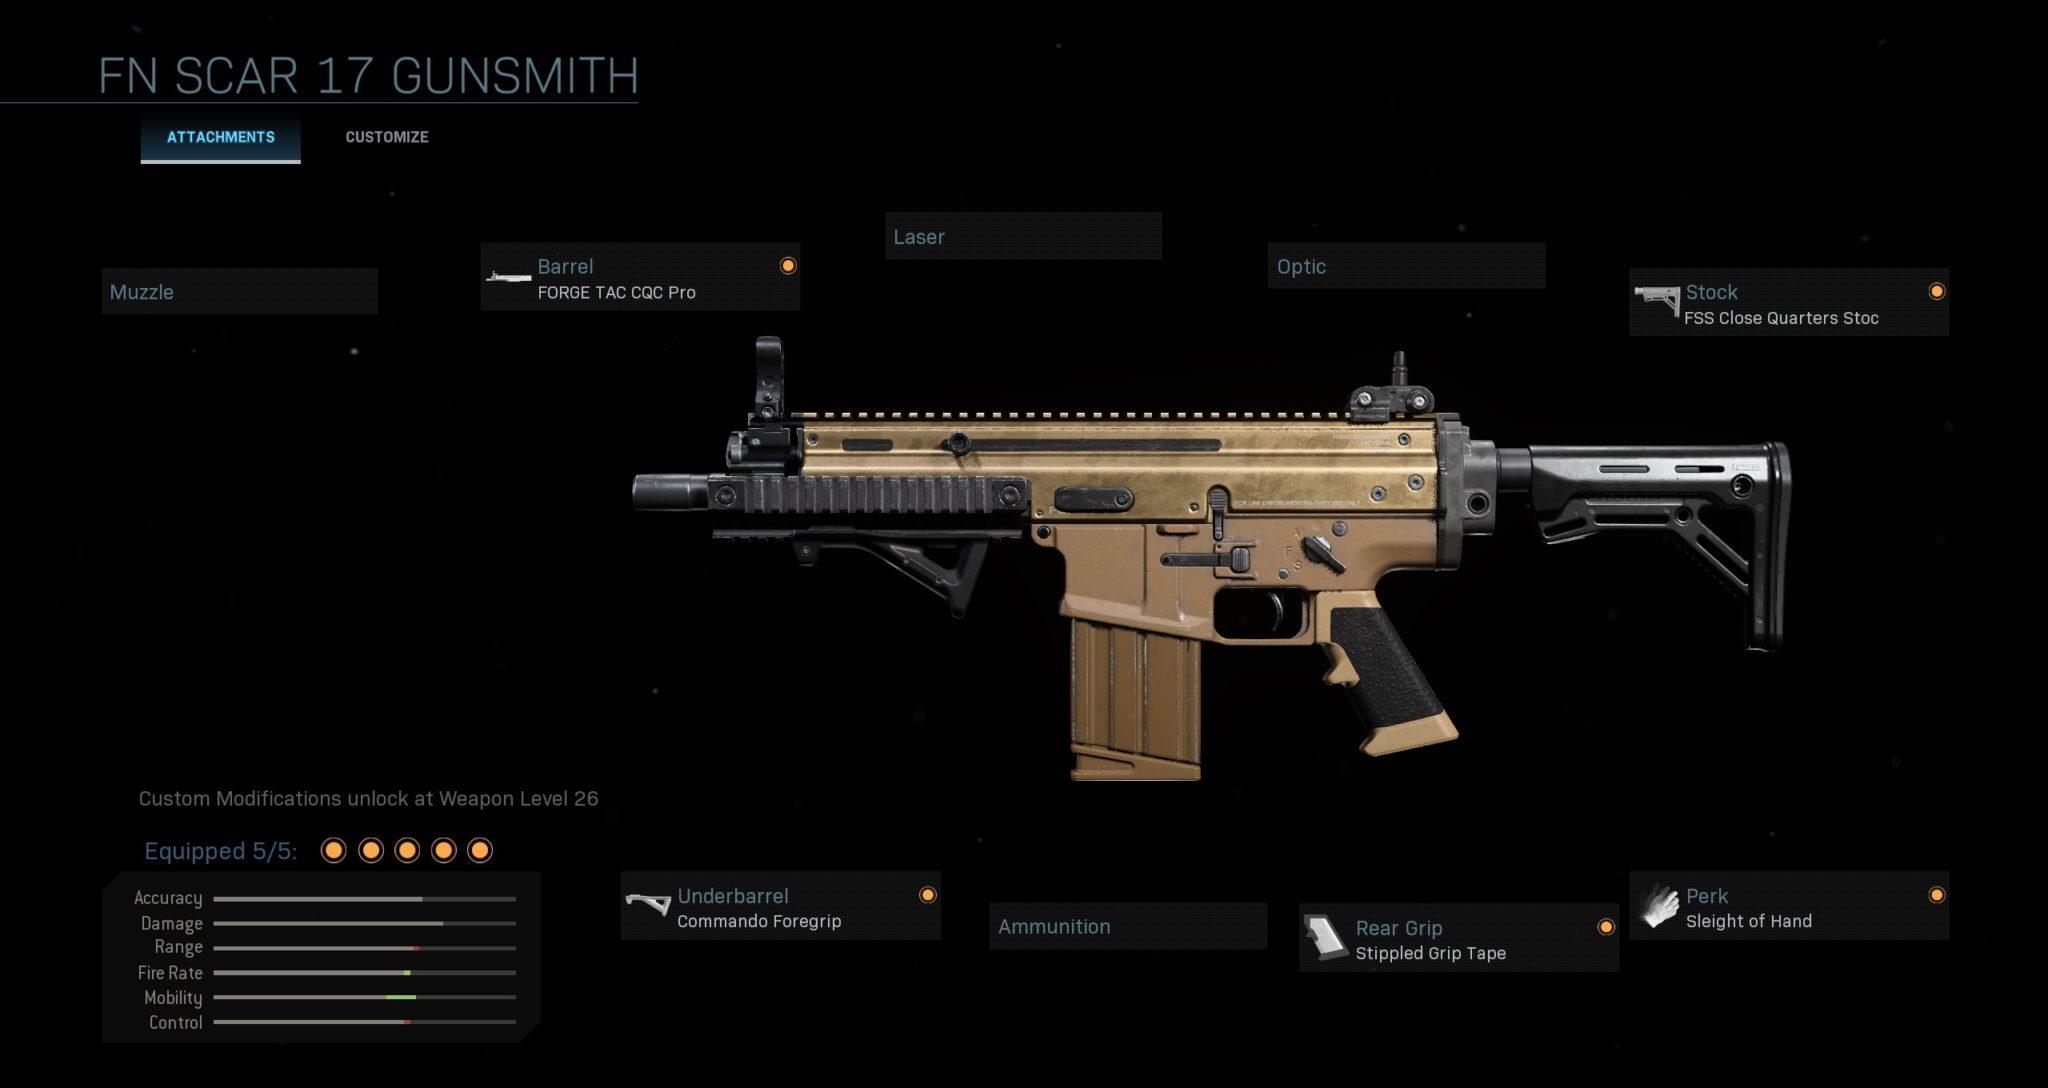 FN Scar 17 multiplayer loadout